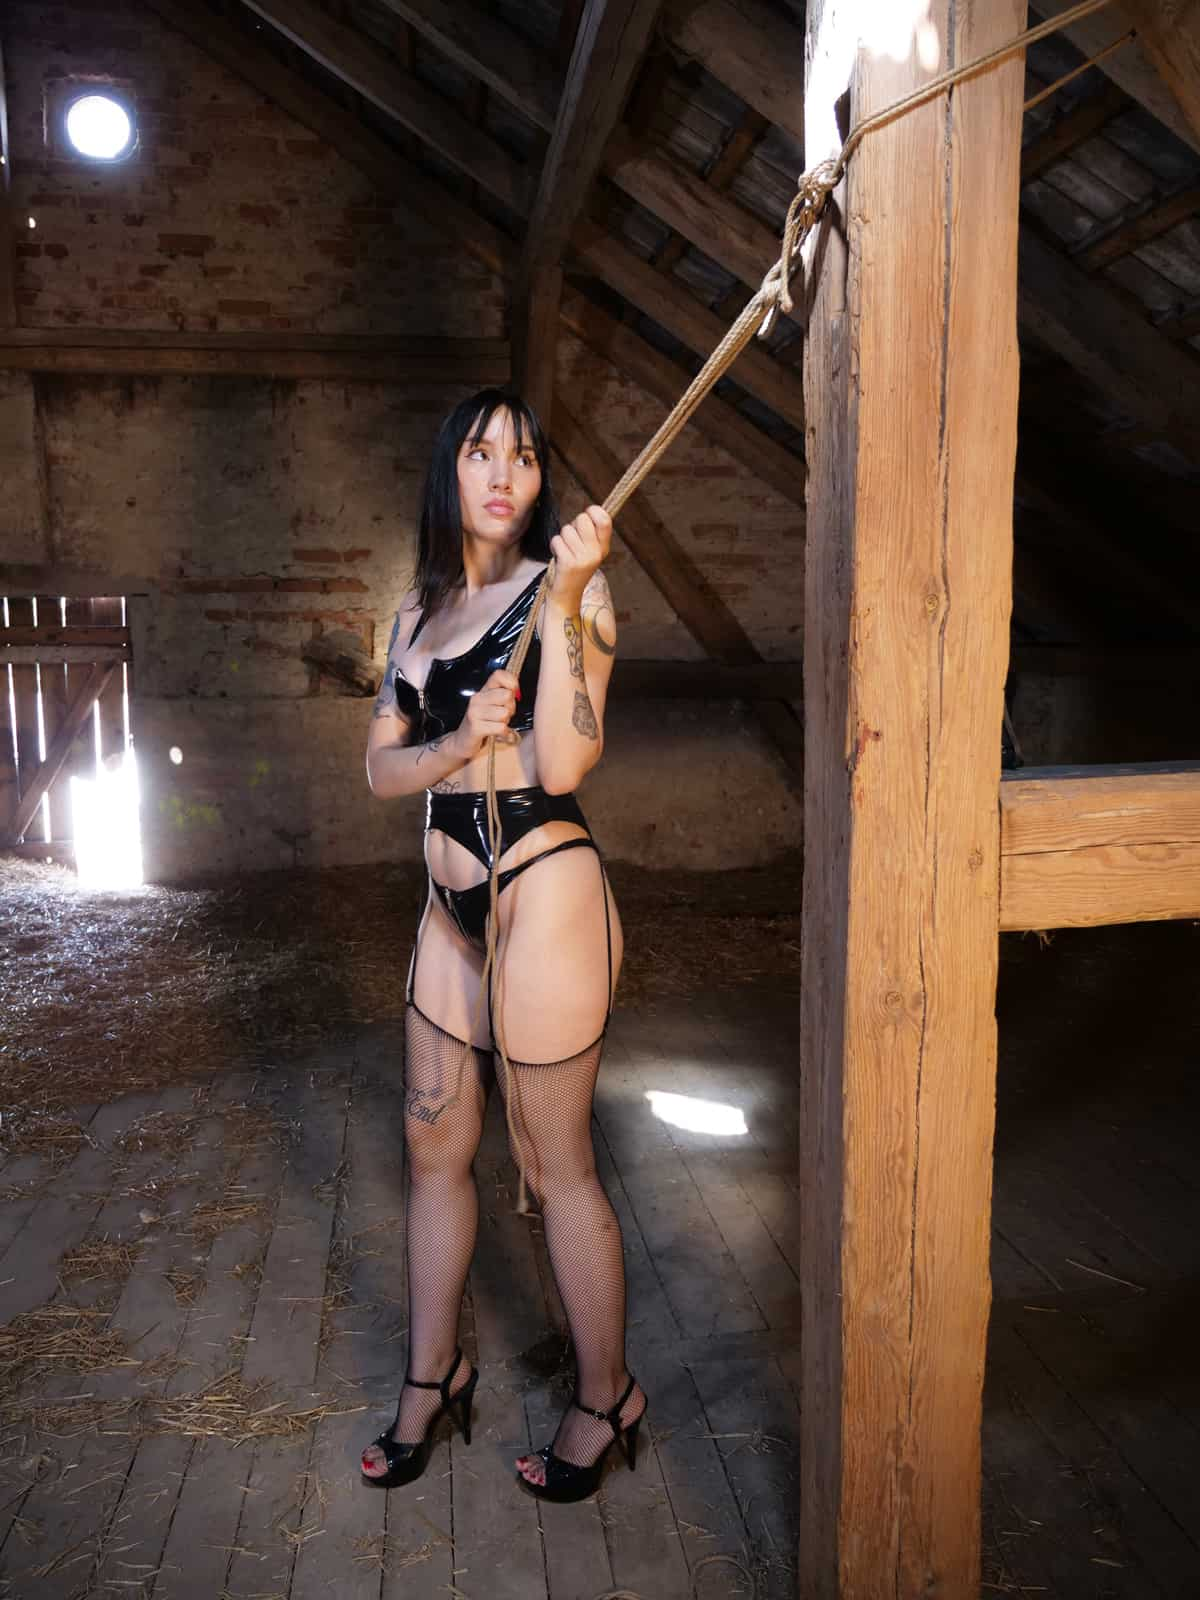 Mistress Fei